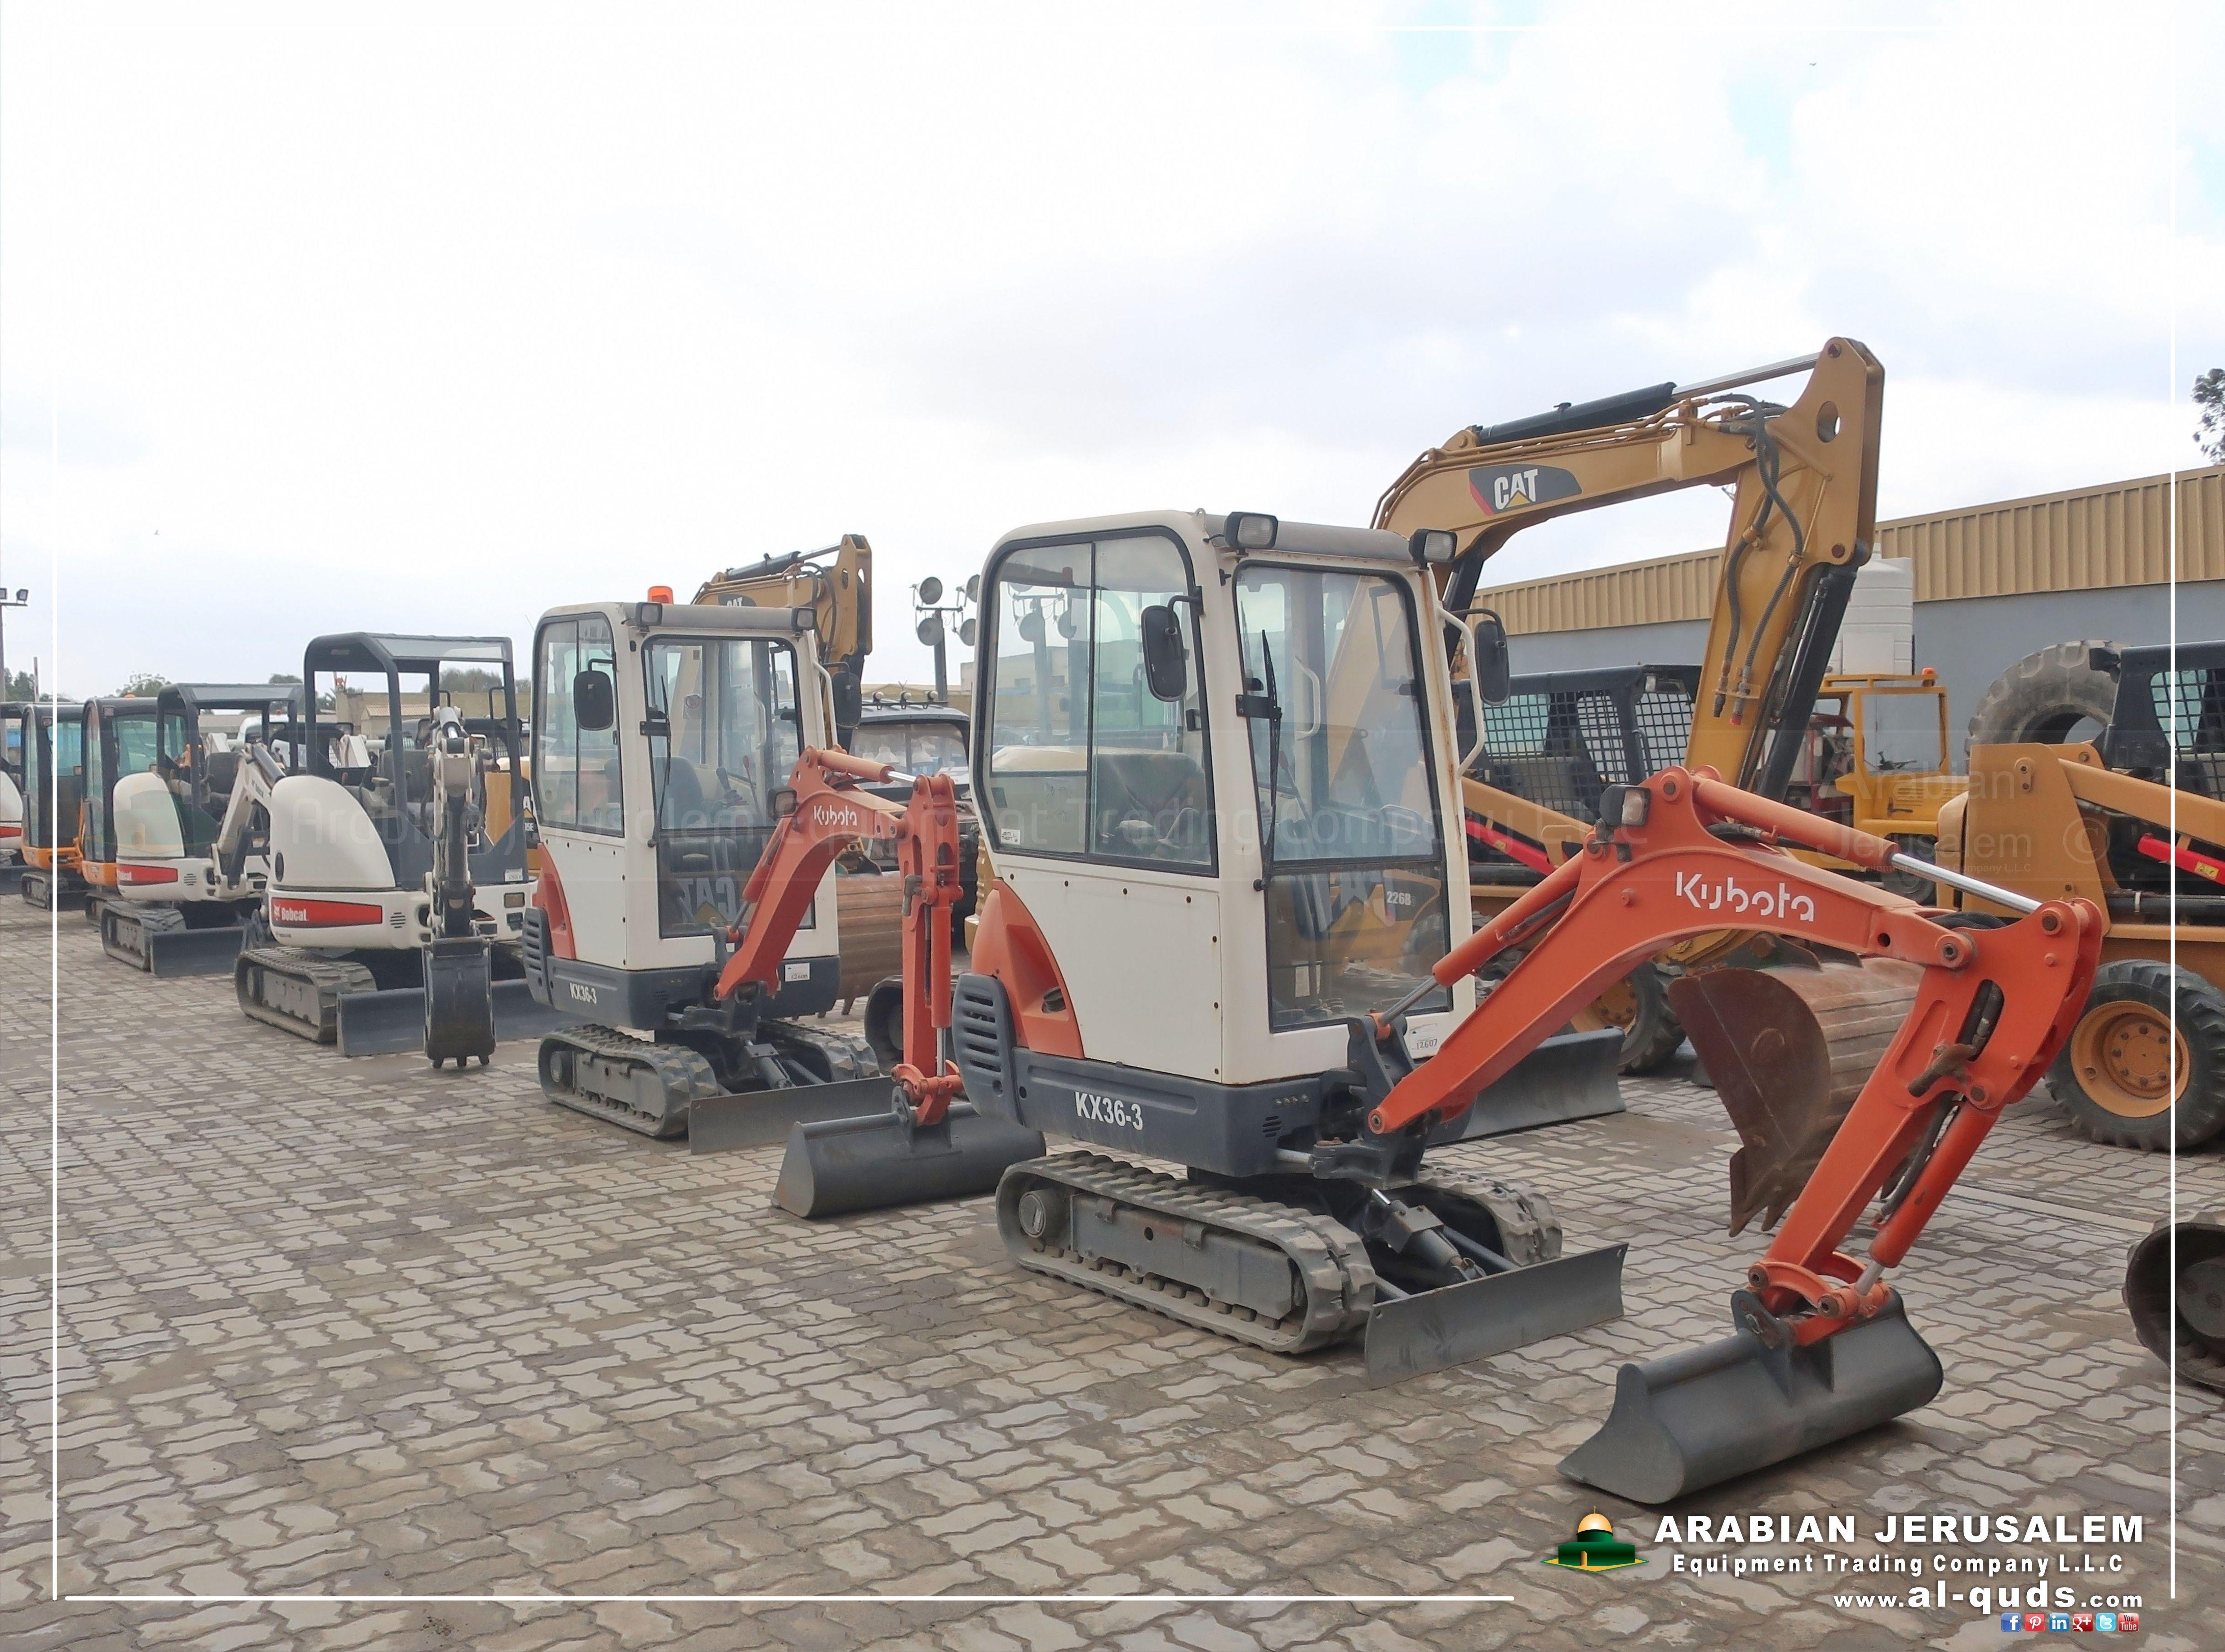 Kubota #BOBCAT #CAT Mini Hydraulic #Excavators - Available